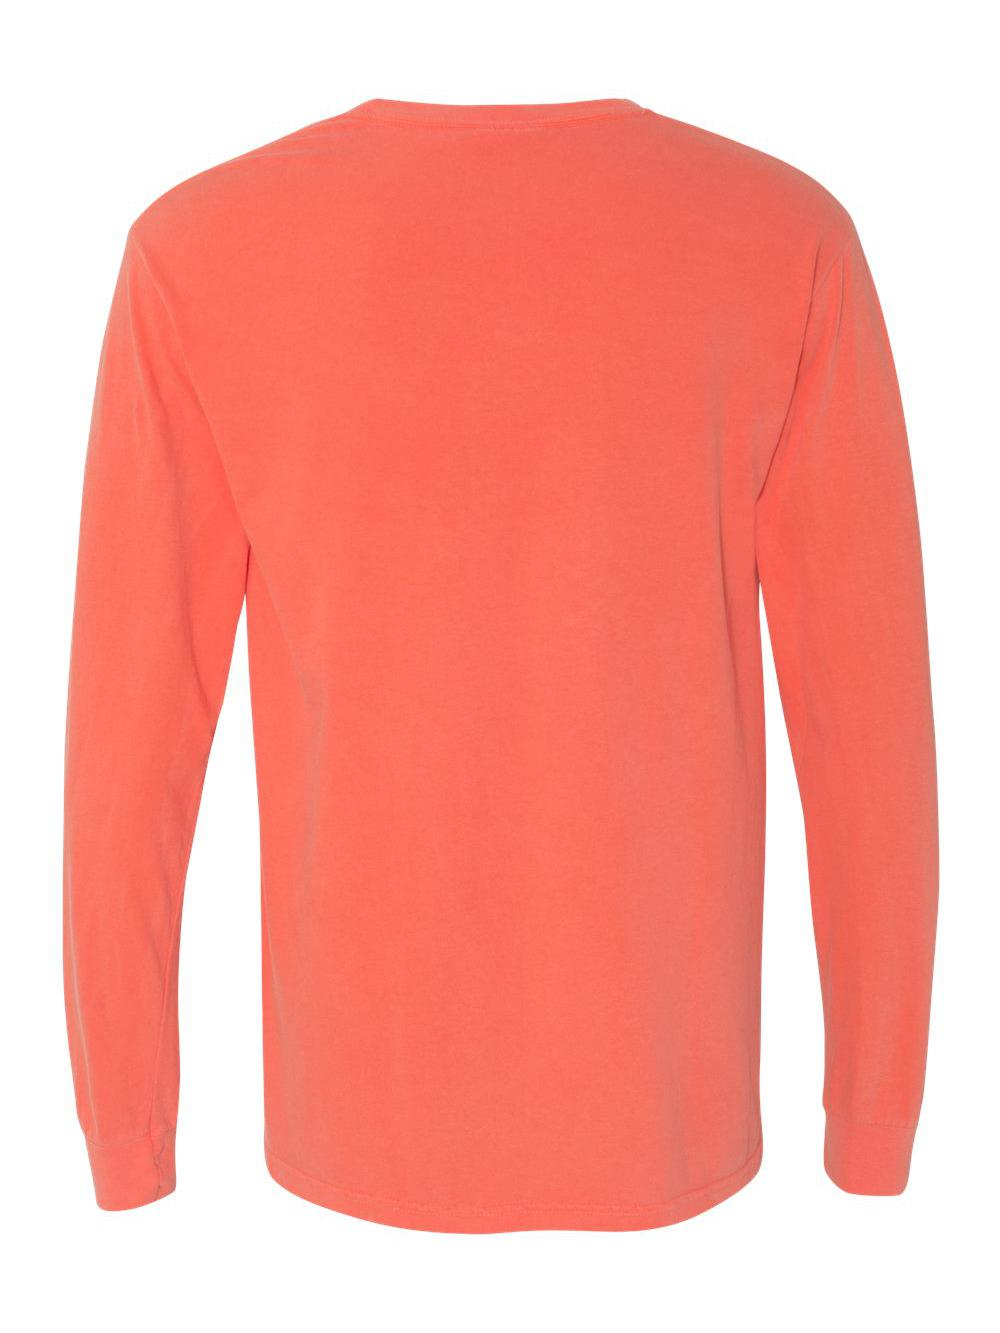 Comfort-Colors-Garment-Dyed-Heavyweight-Ringspun-Long-Sleeve-T-Shirt-6014 thumbnail 19